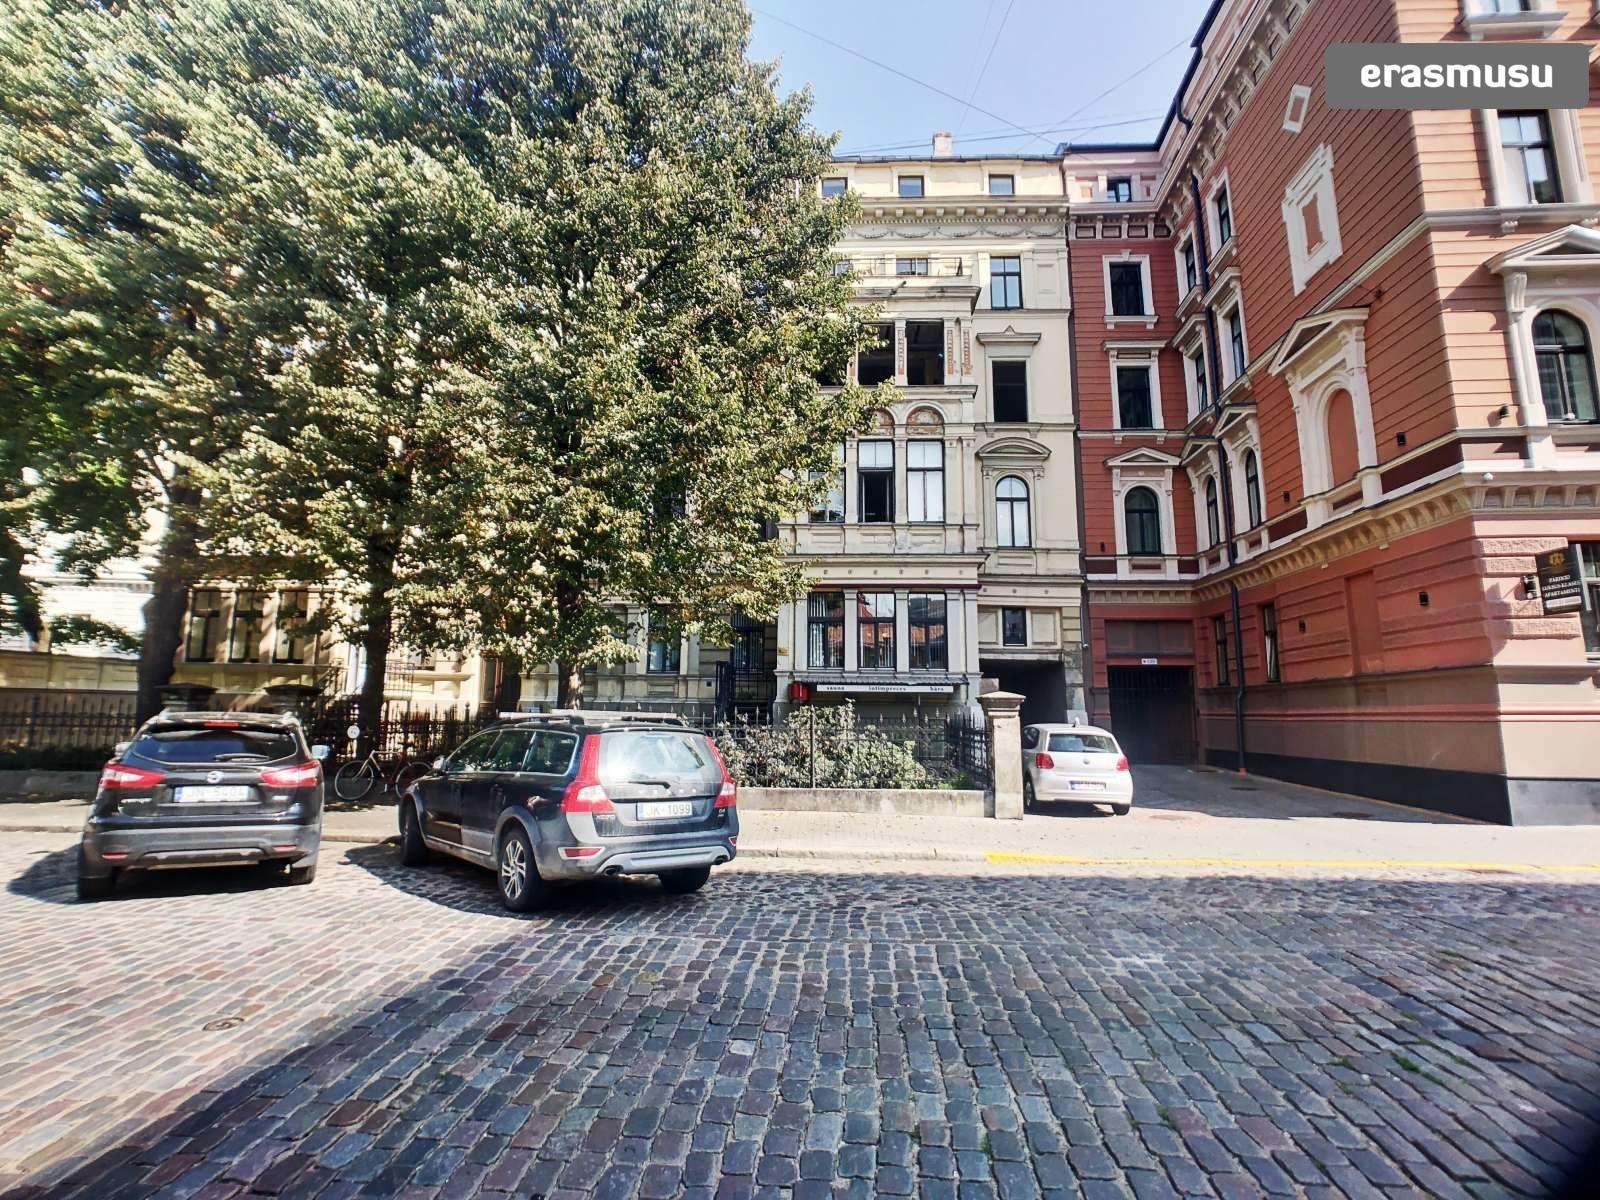 modern-1-bedroom-apartment-rent-centrs-de9334222e5345a28e2bee507